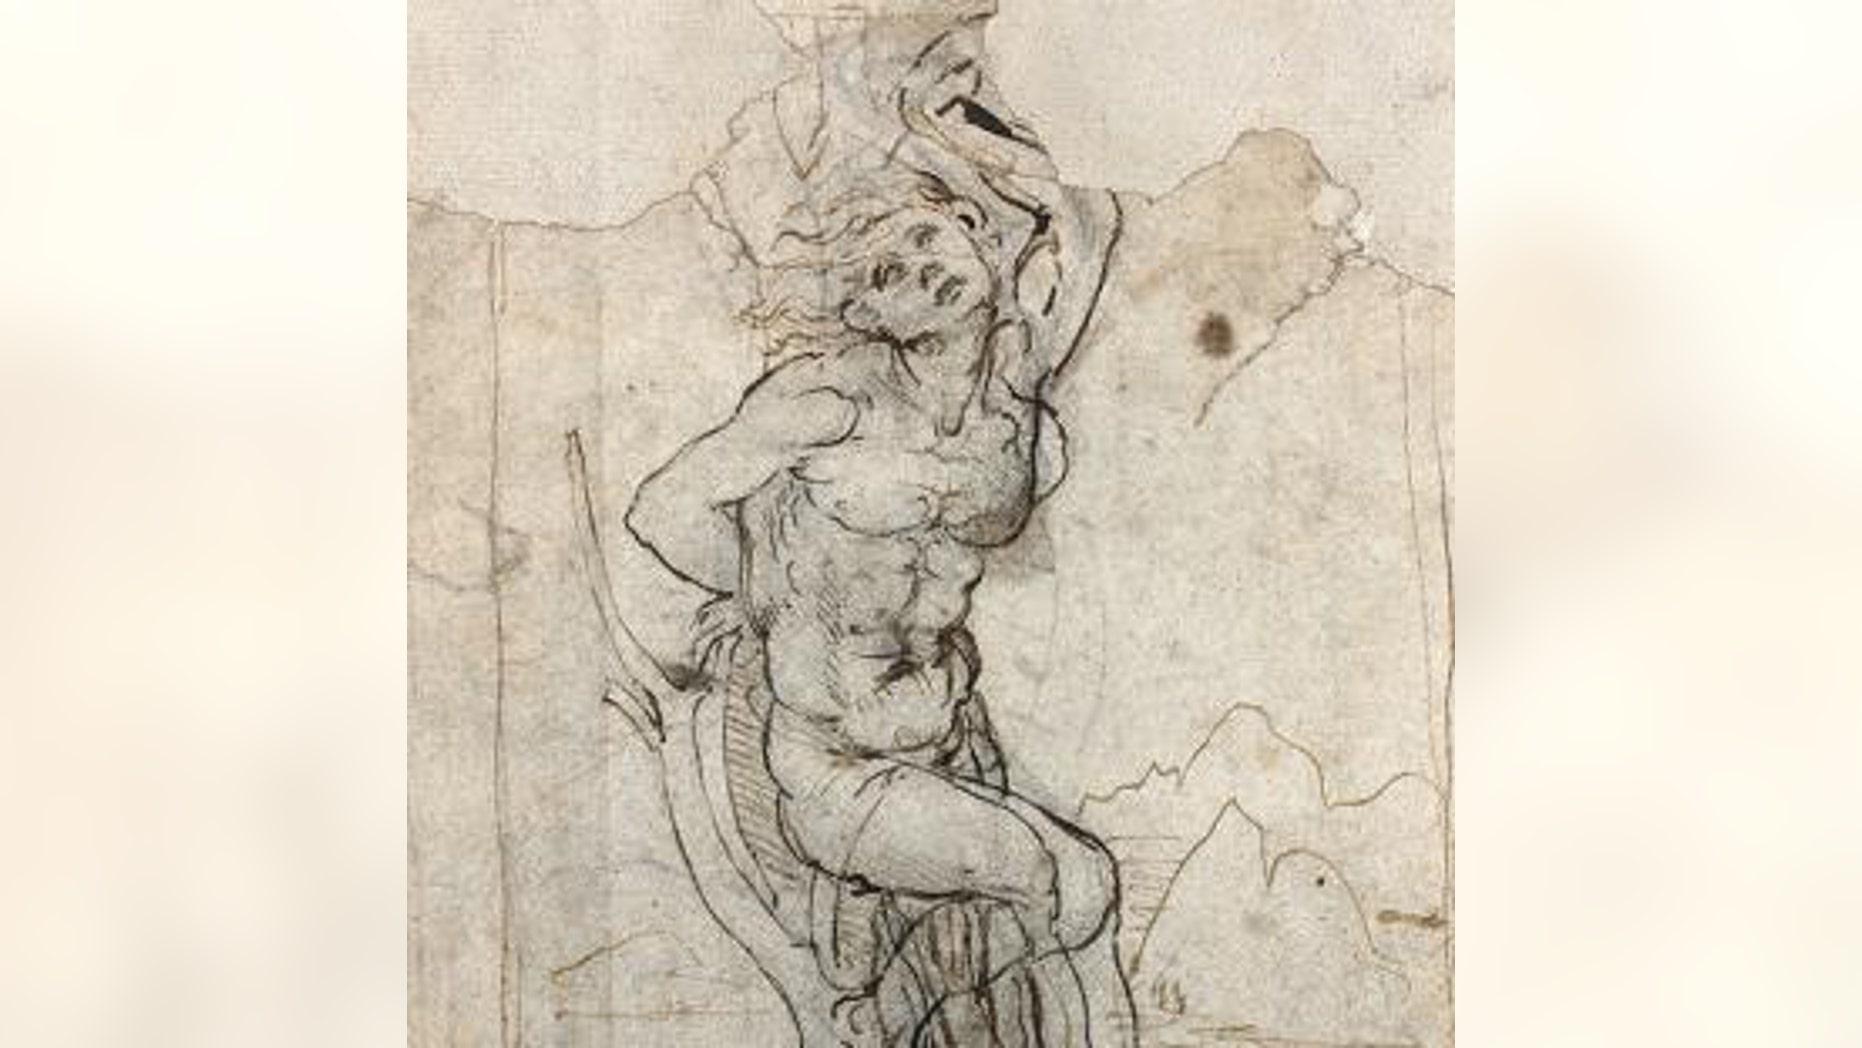 Leonardo Da Vinci's drawing of St. Sebastian (Tajan).